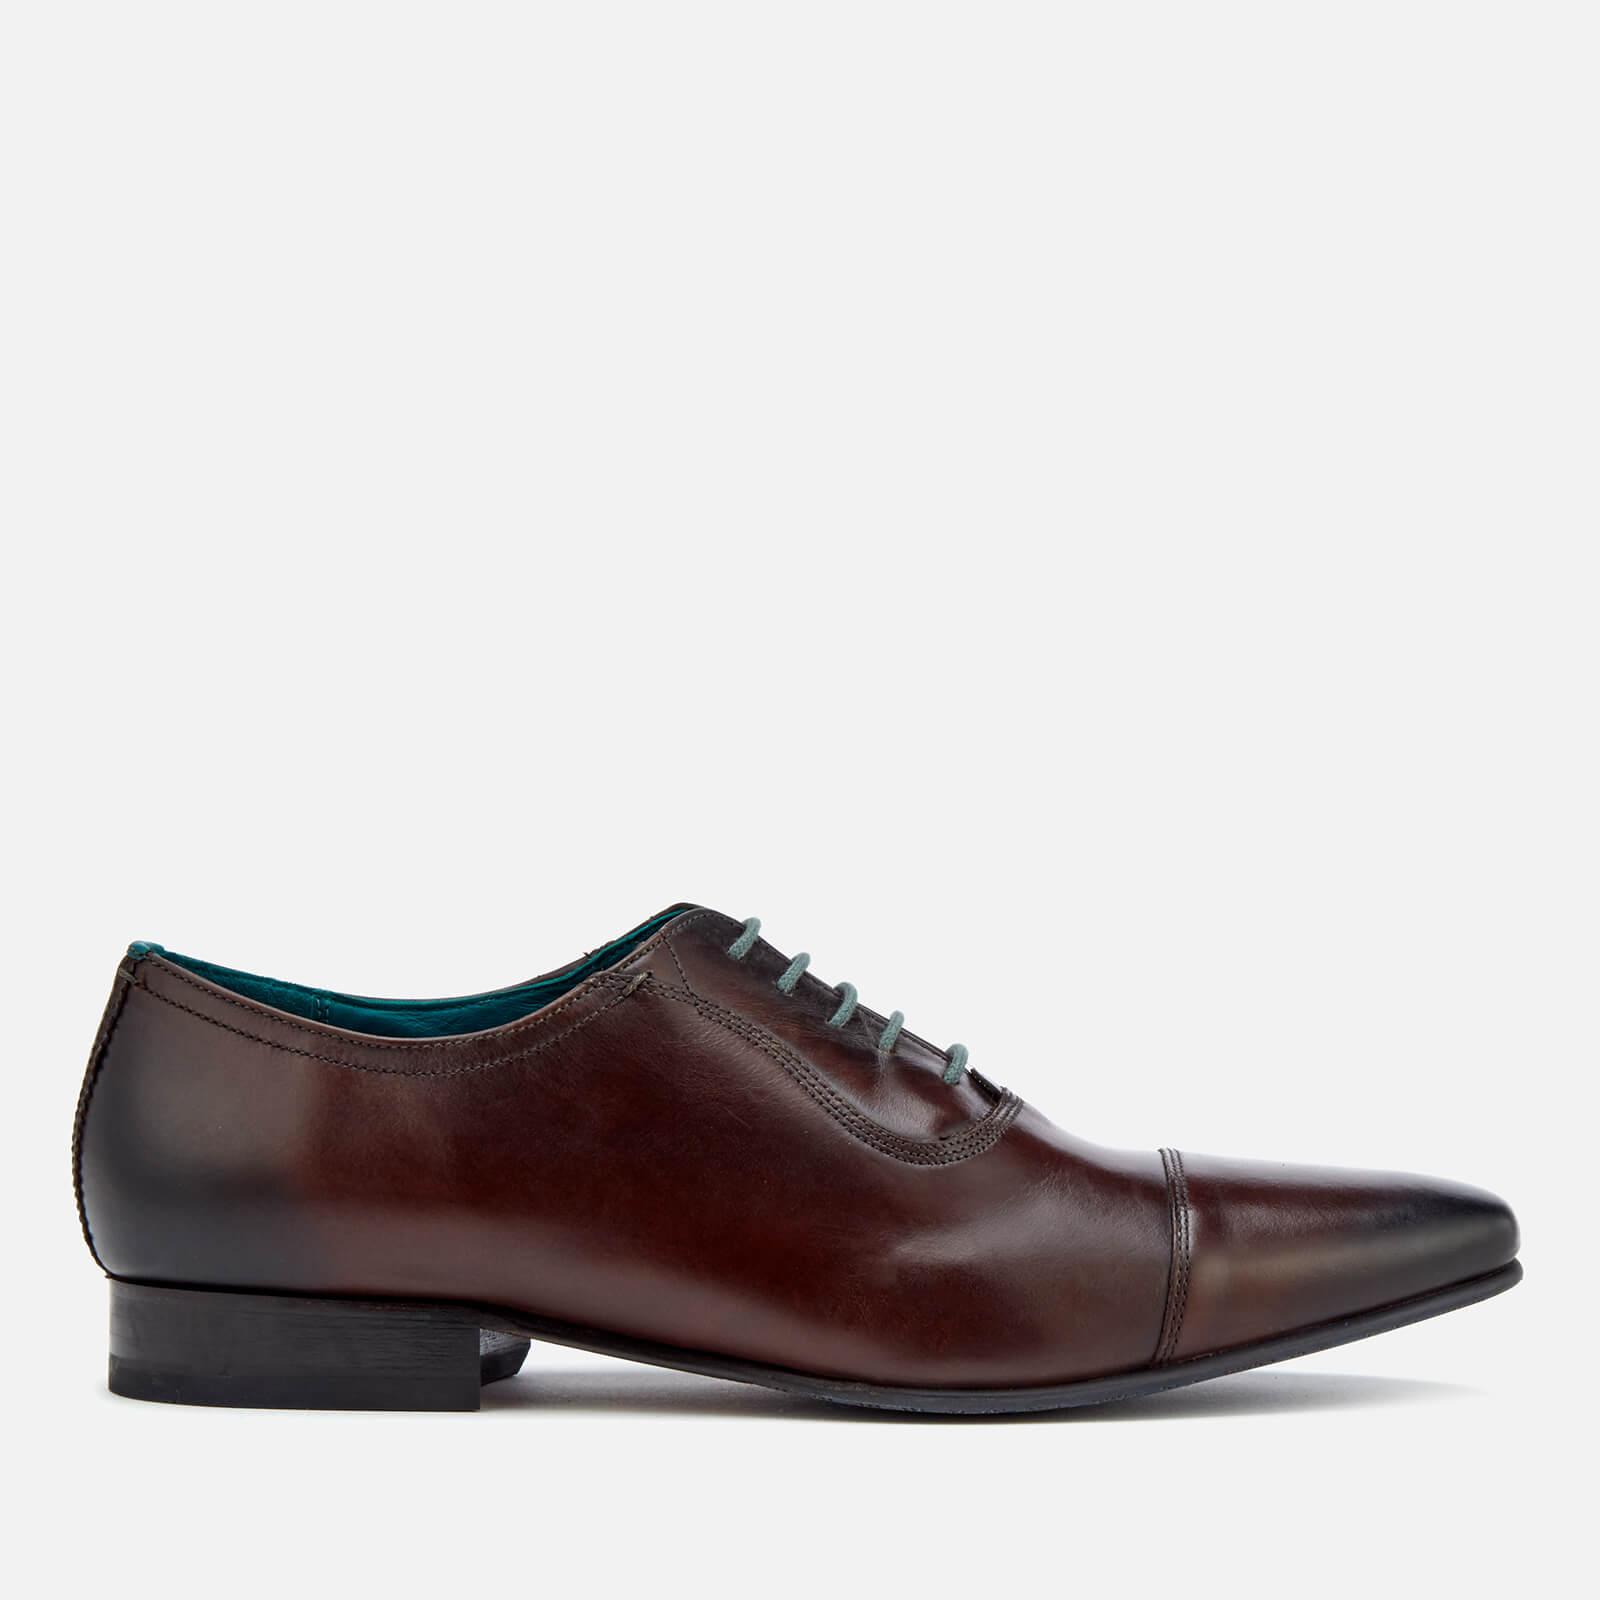 Ted Baker Men's Karney Leather Toe-Cap Oxford Shoes - Brown - UK 7